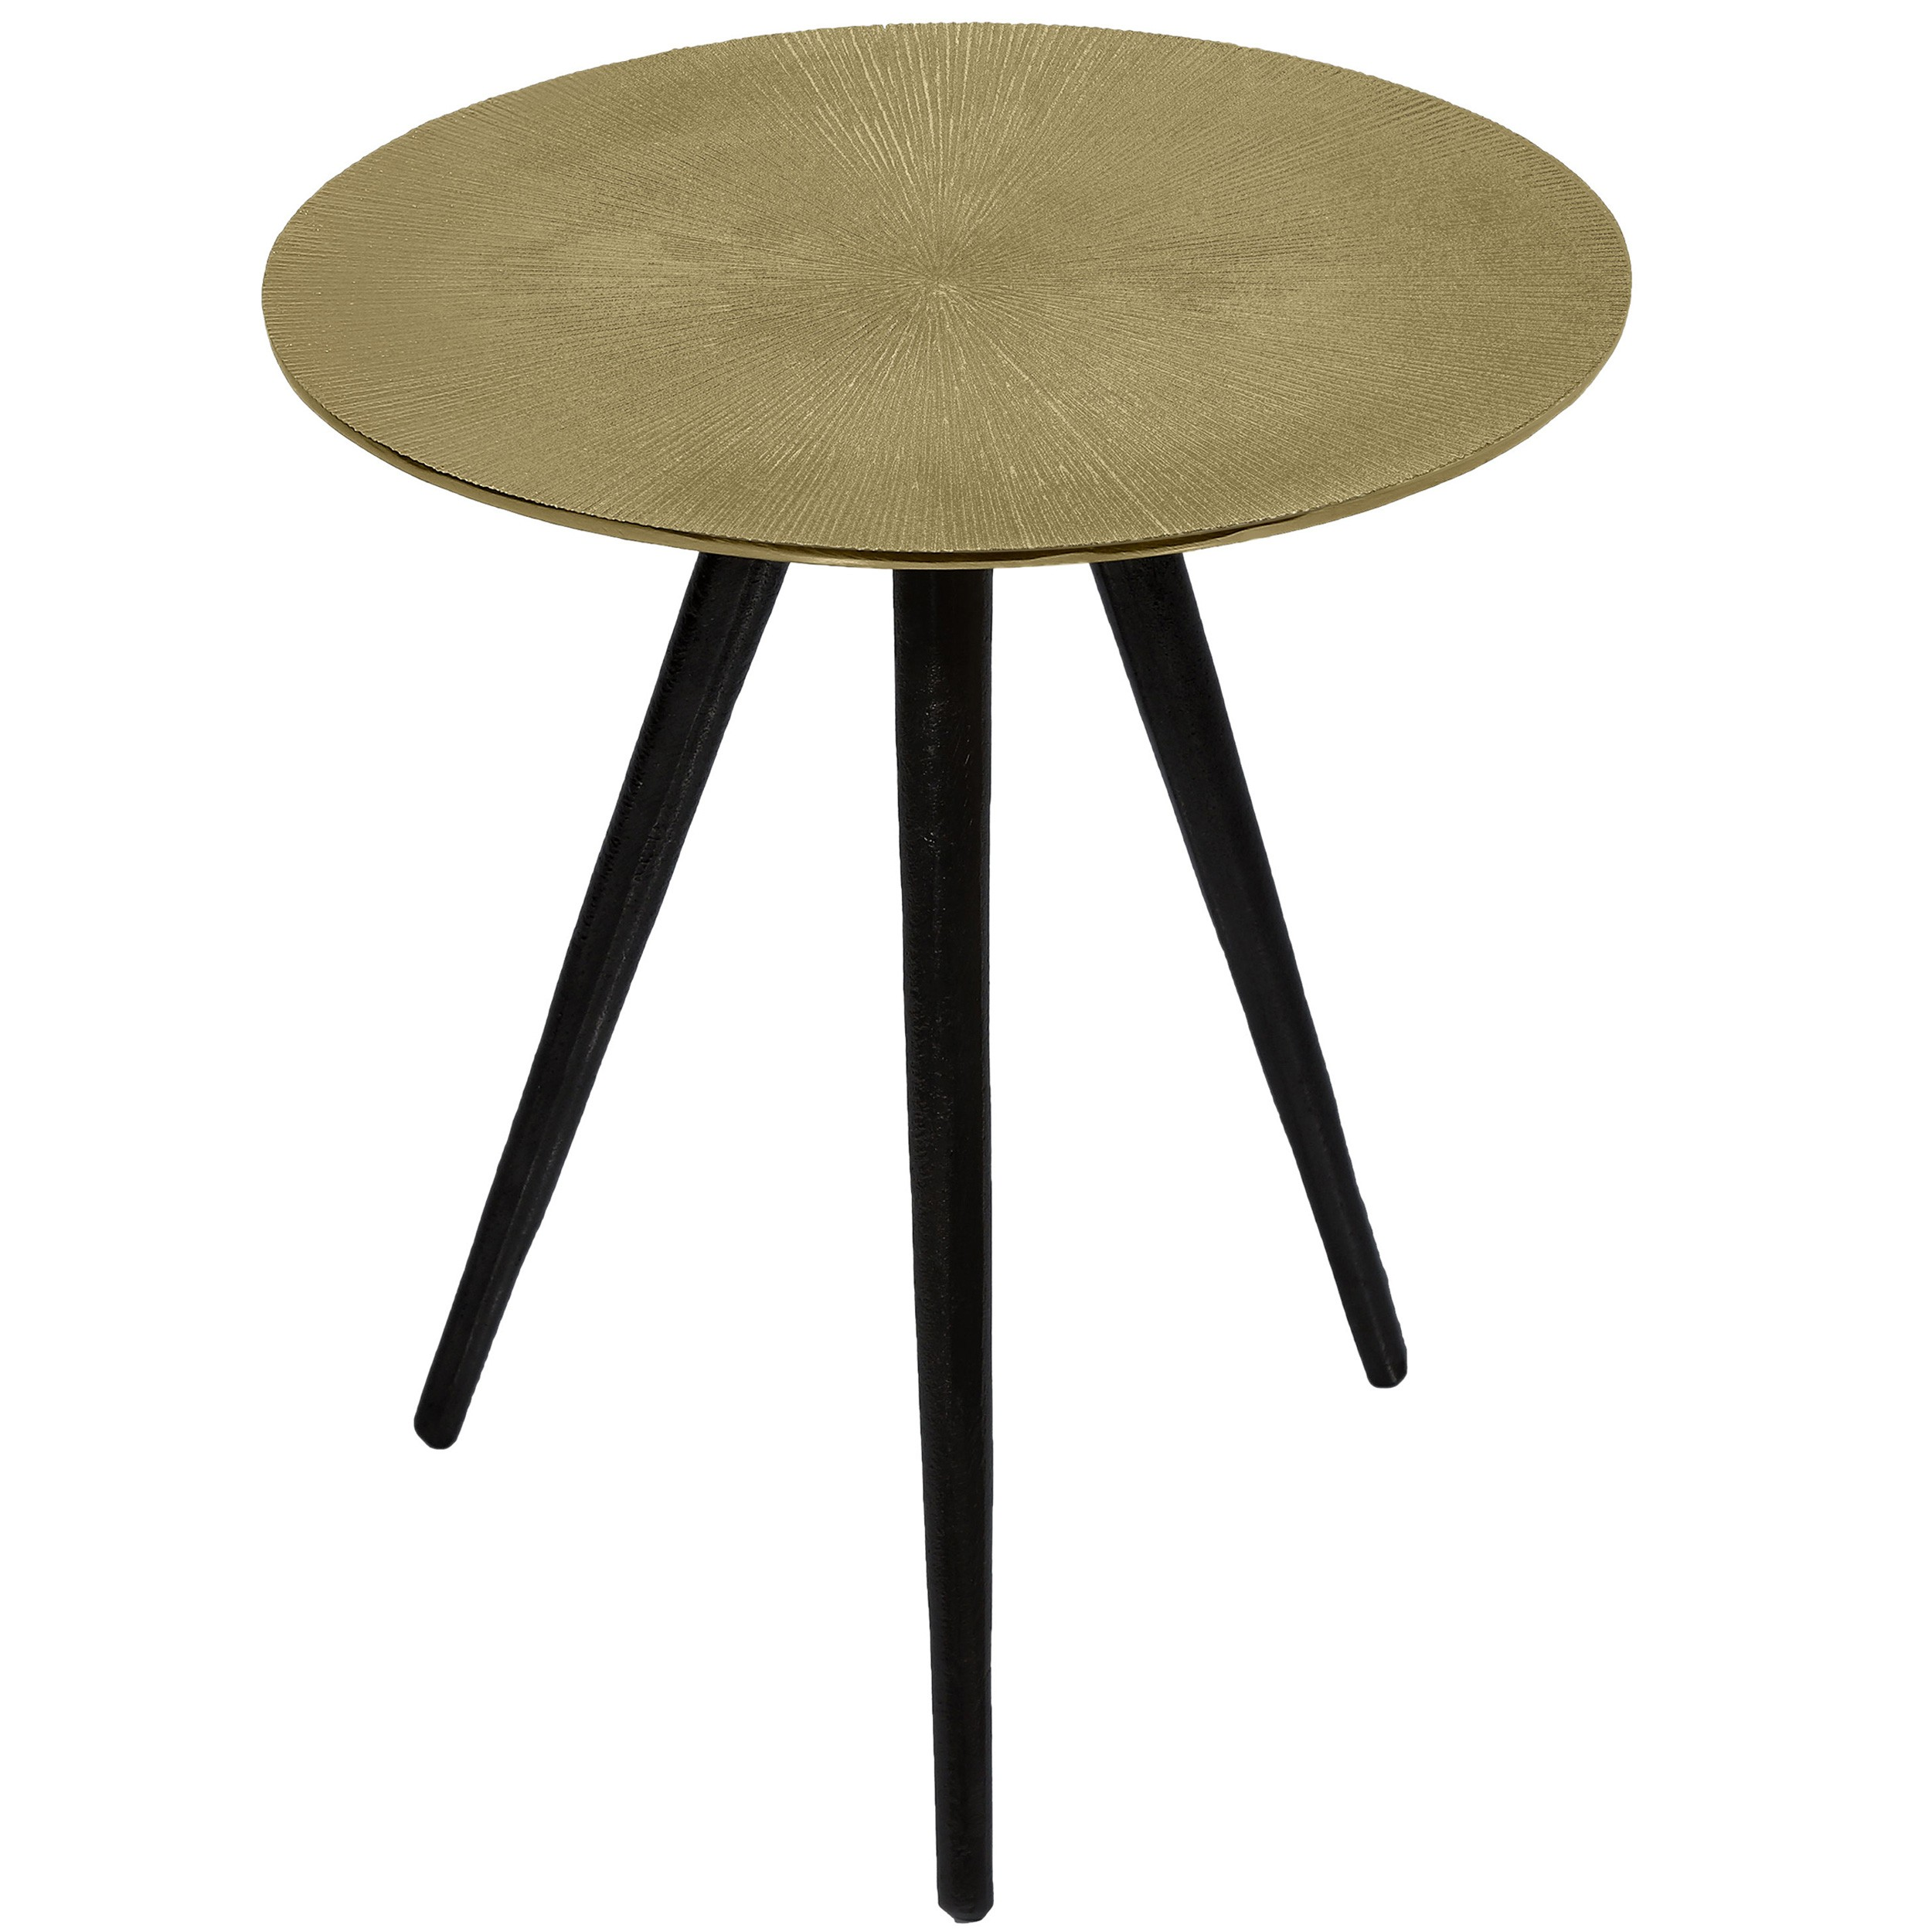 Table basse ronde rivak laiton choisissez les tables for Acheter table ronde